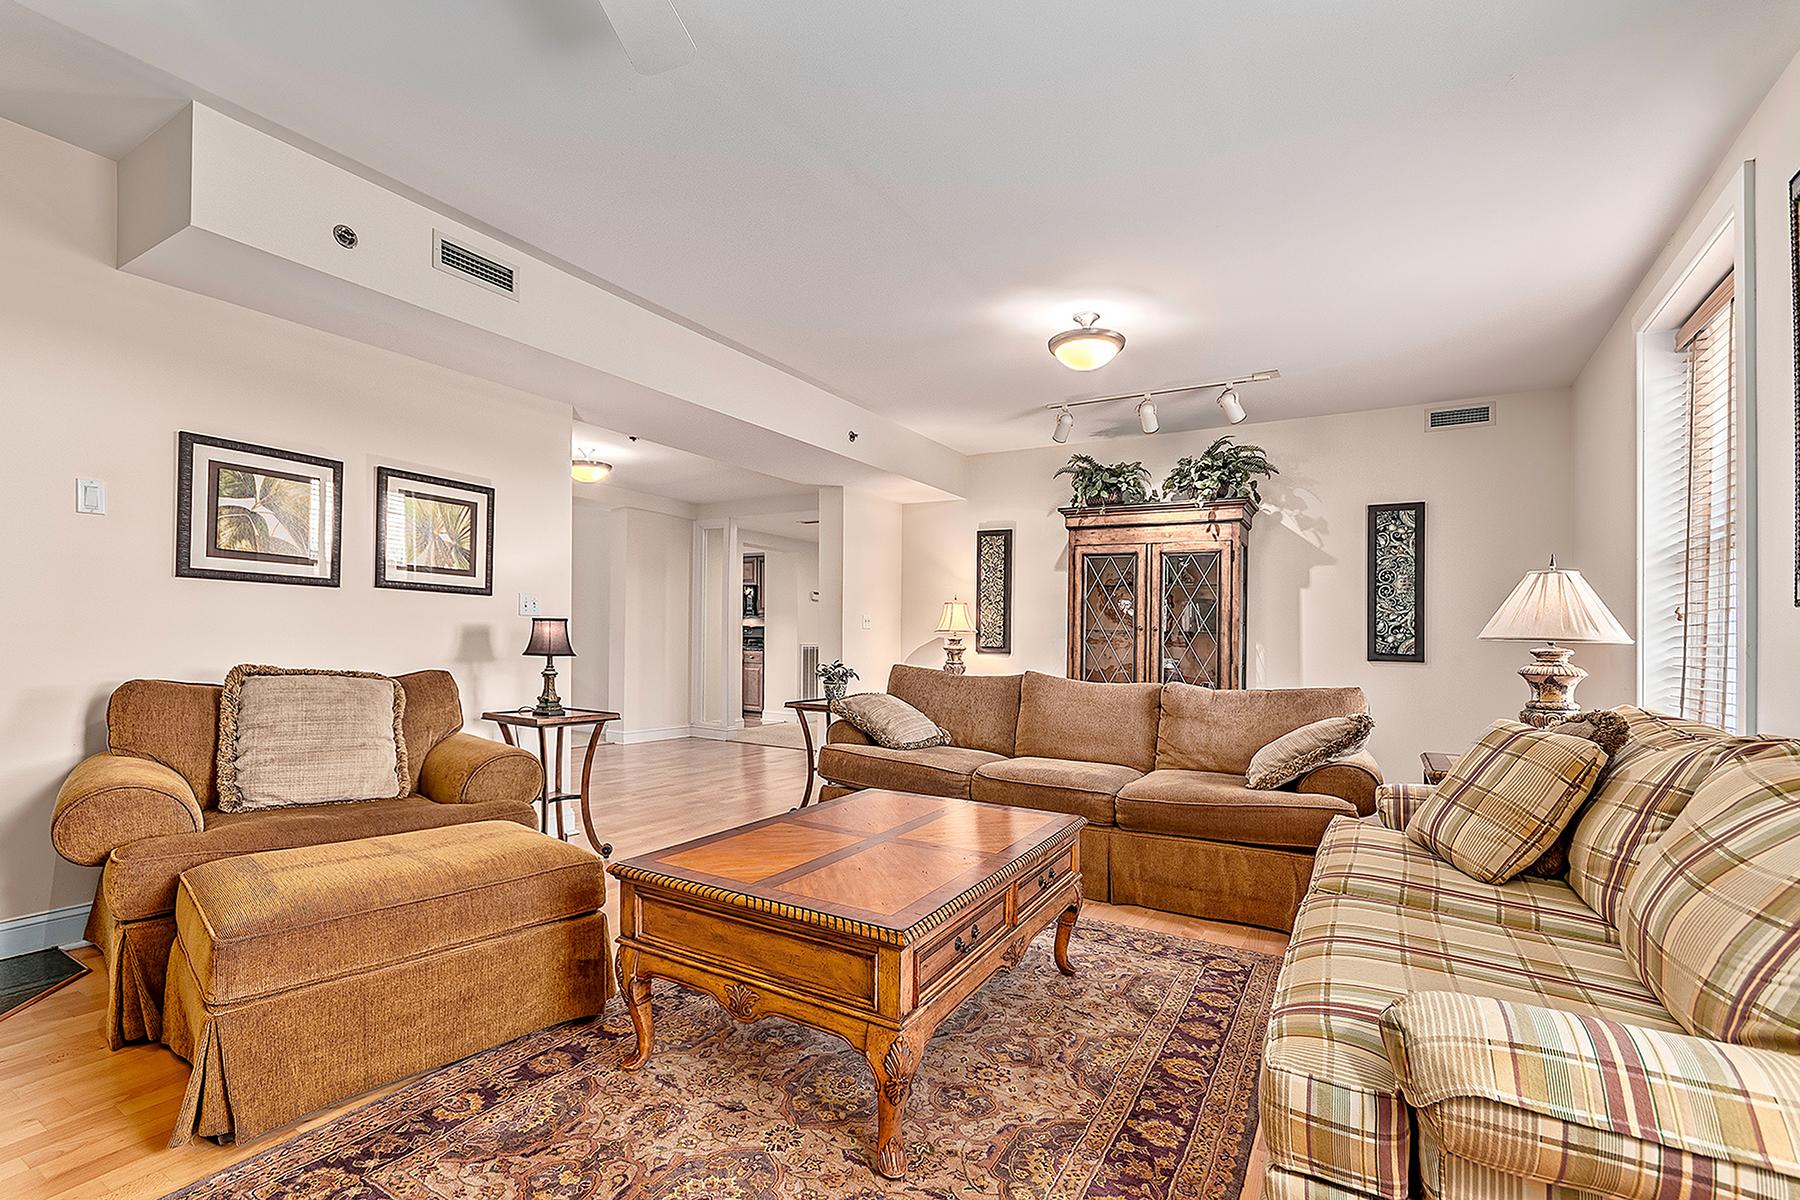 Additional photo for property listing at BILTMORE VILLAGE 8  Village Ln,  Asheville, North Carolina 28803 United States